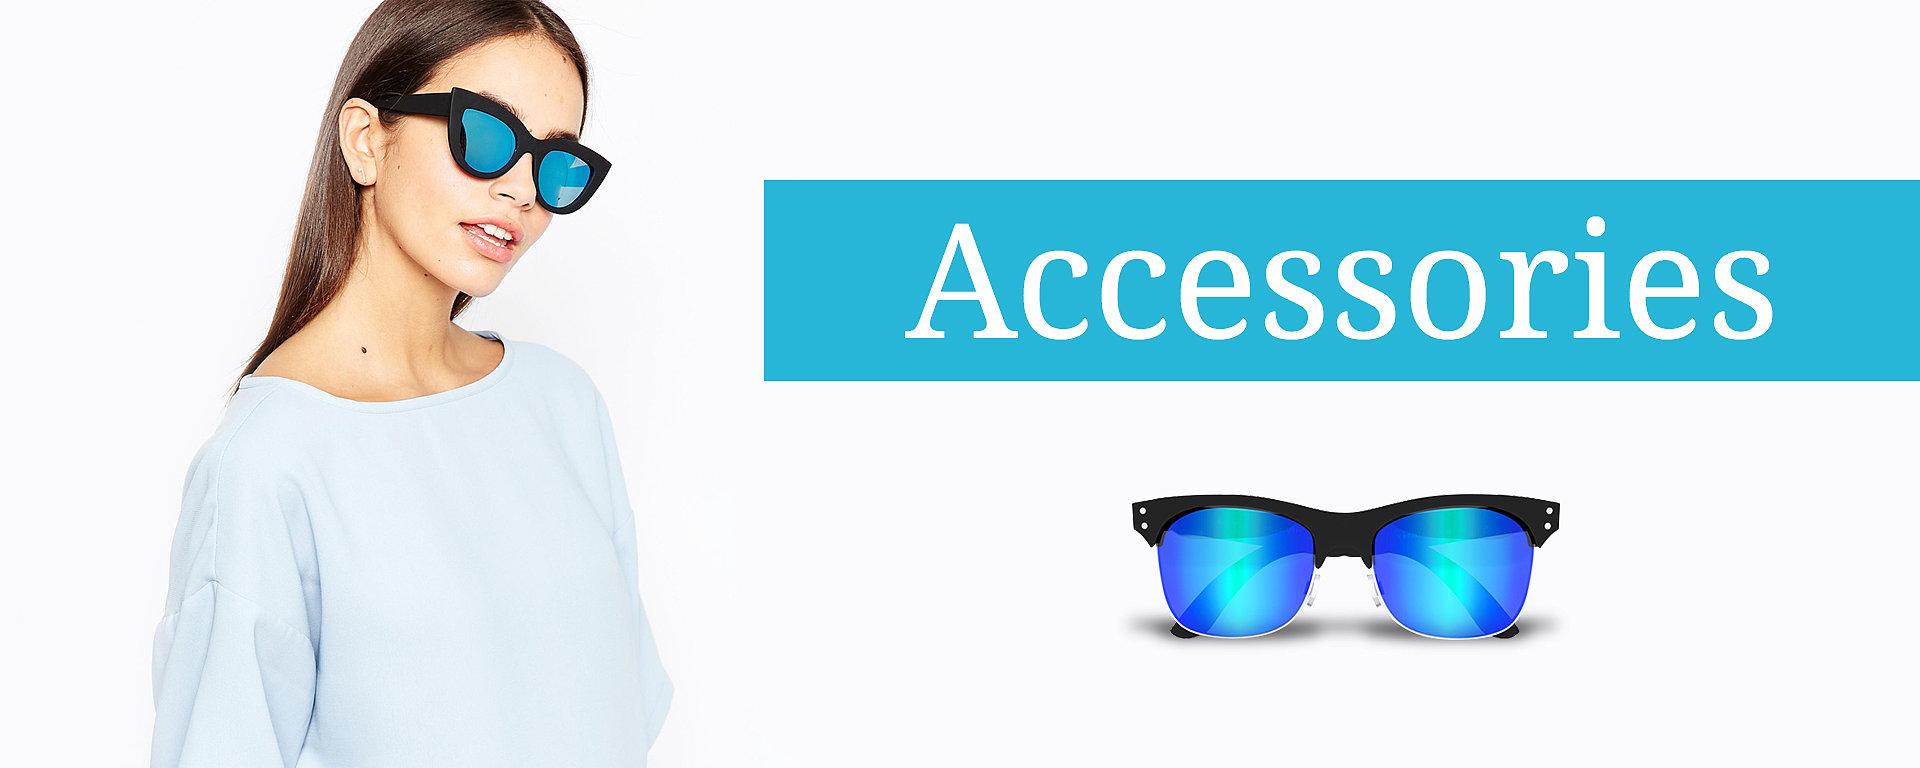 Accessories_1920_768